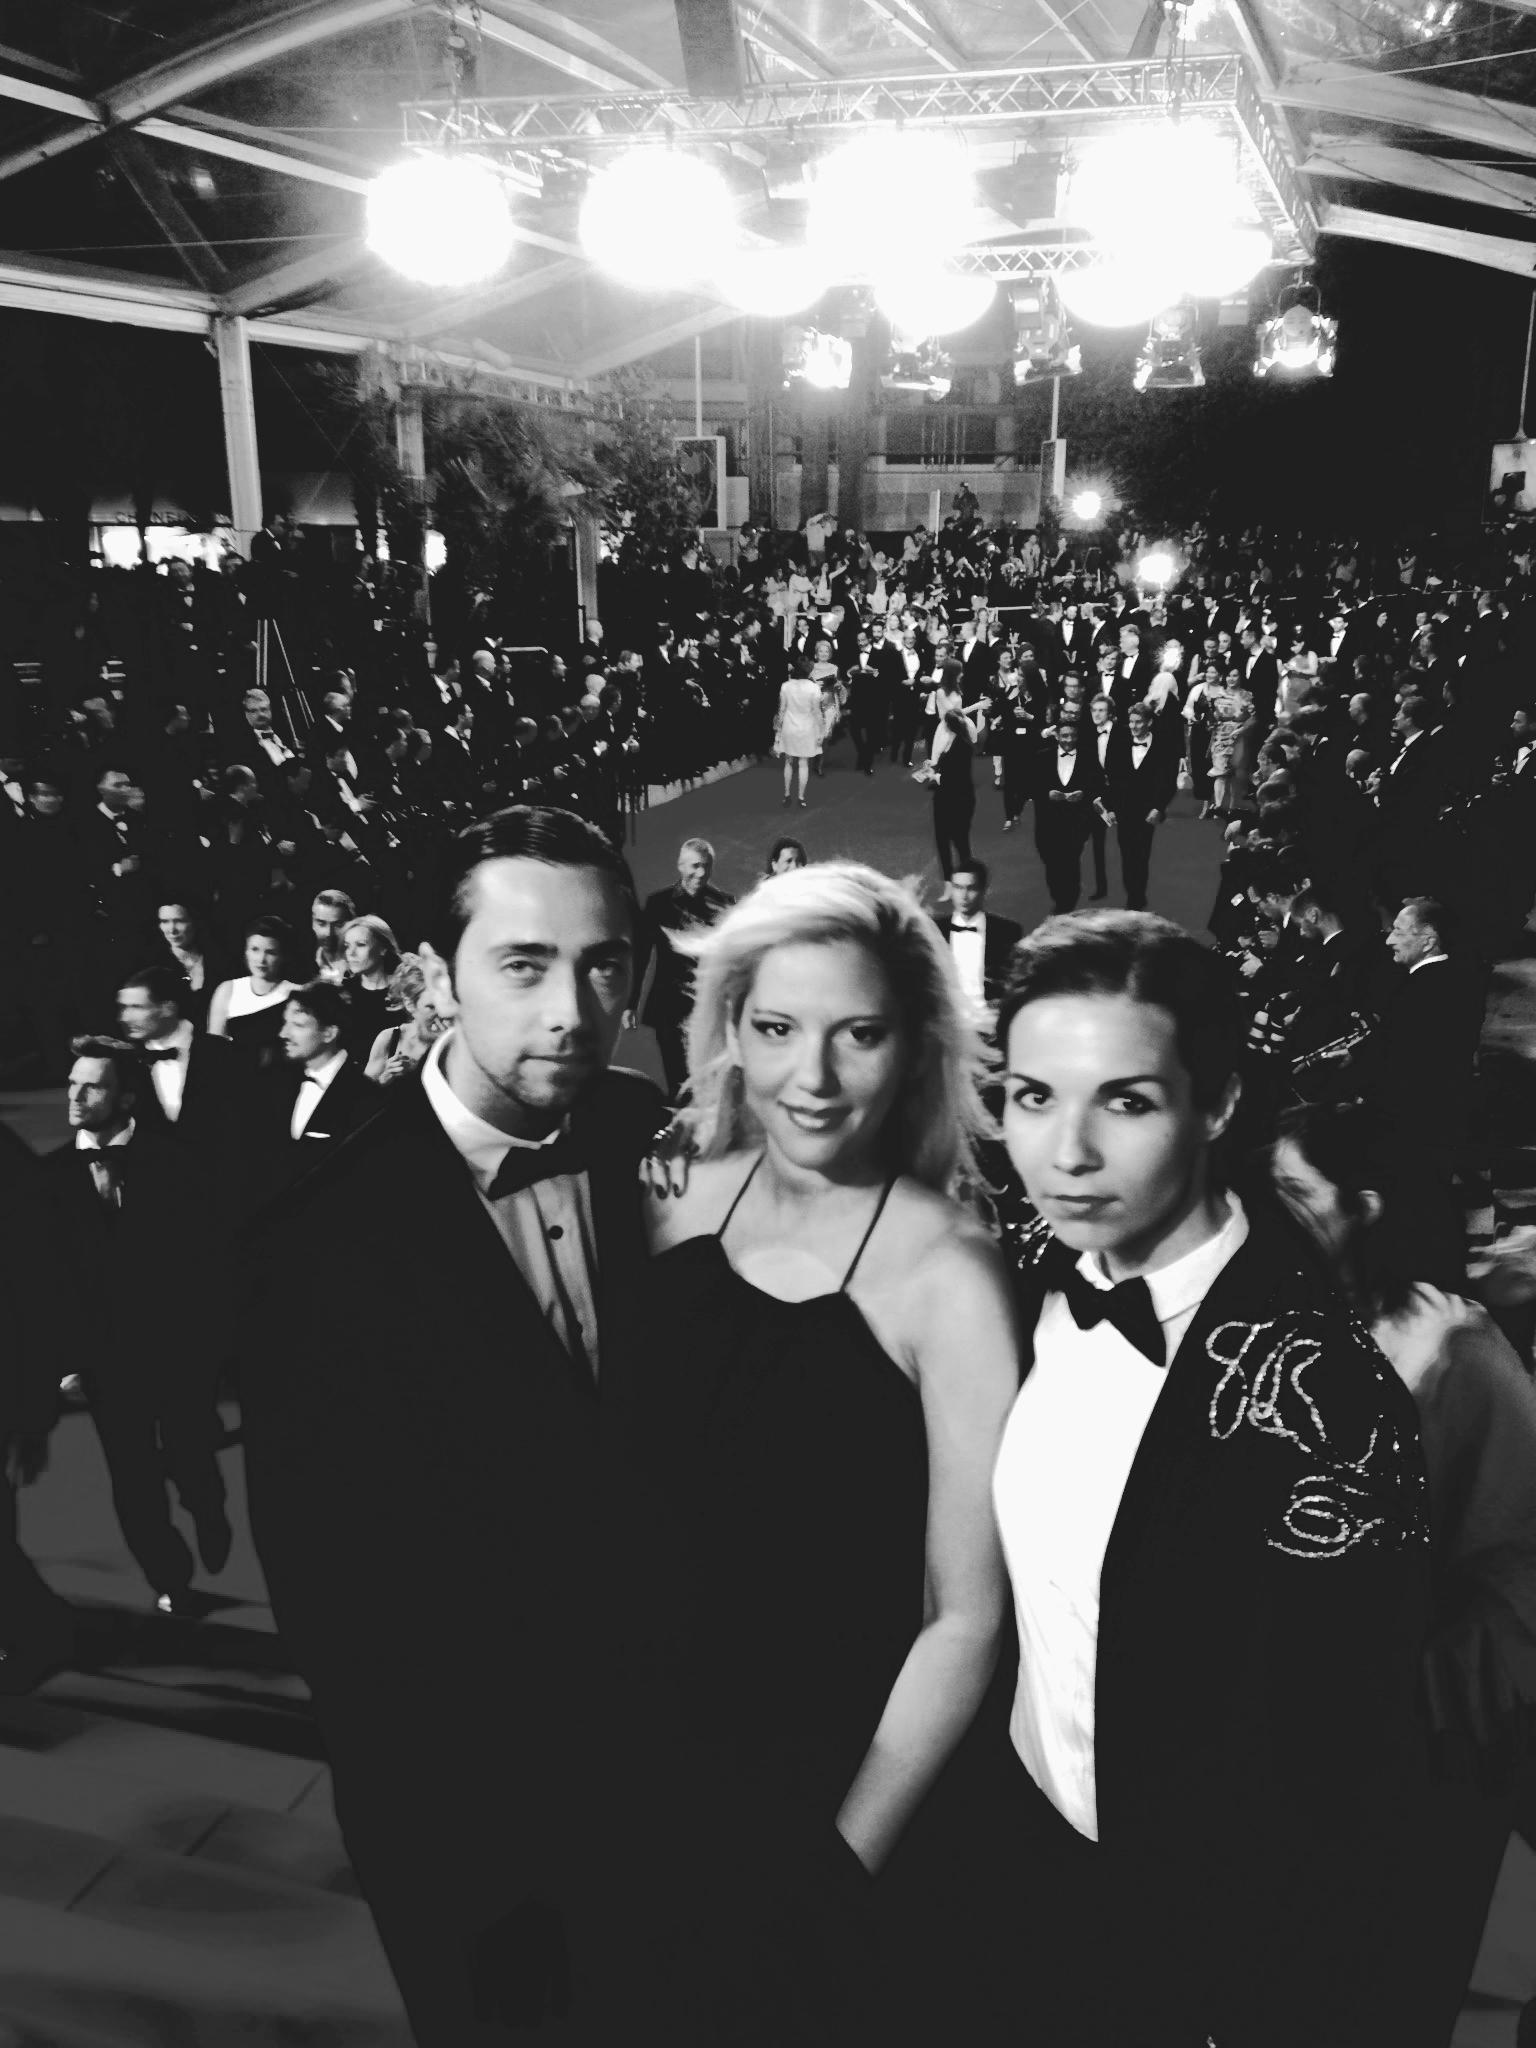 Mor Shamay_Cannes premiere.jpg